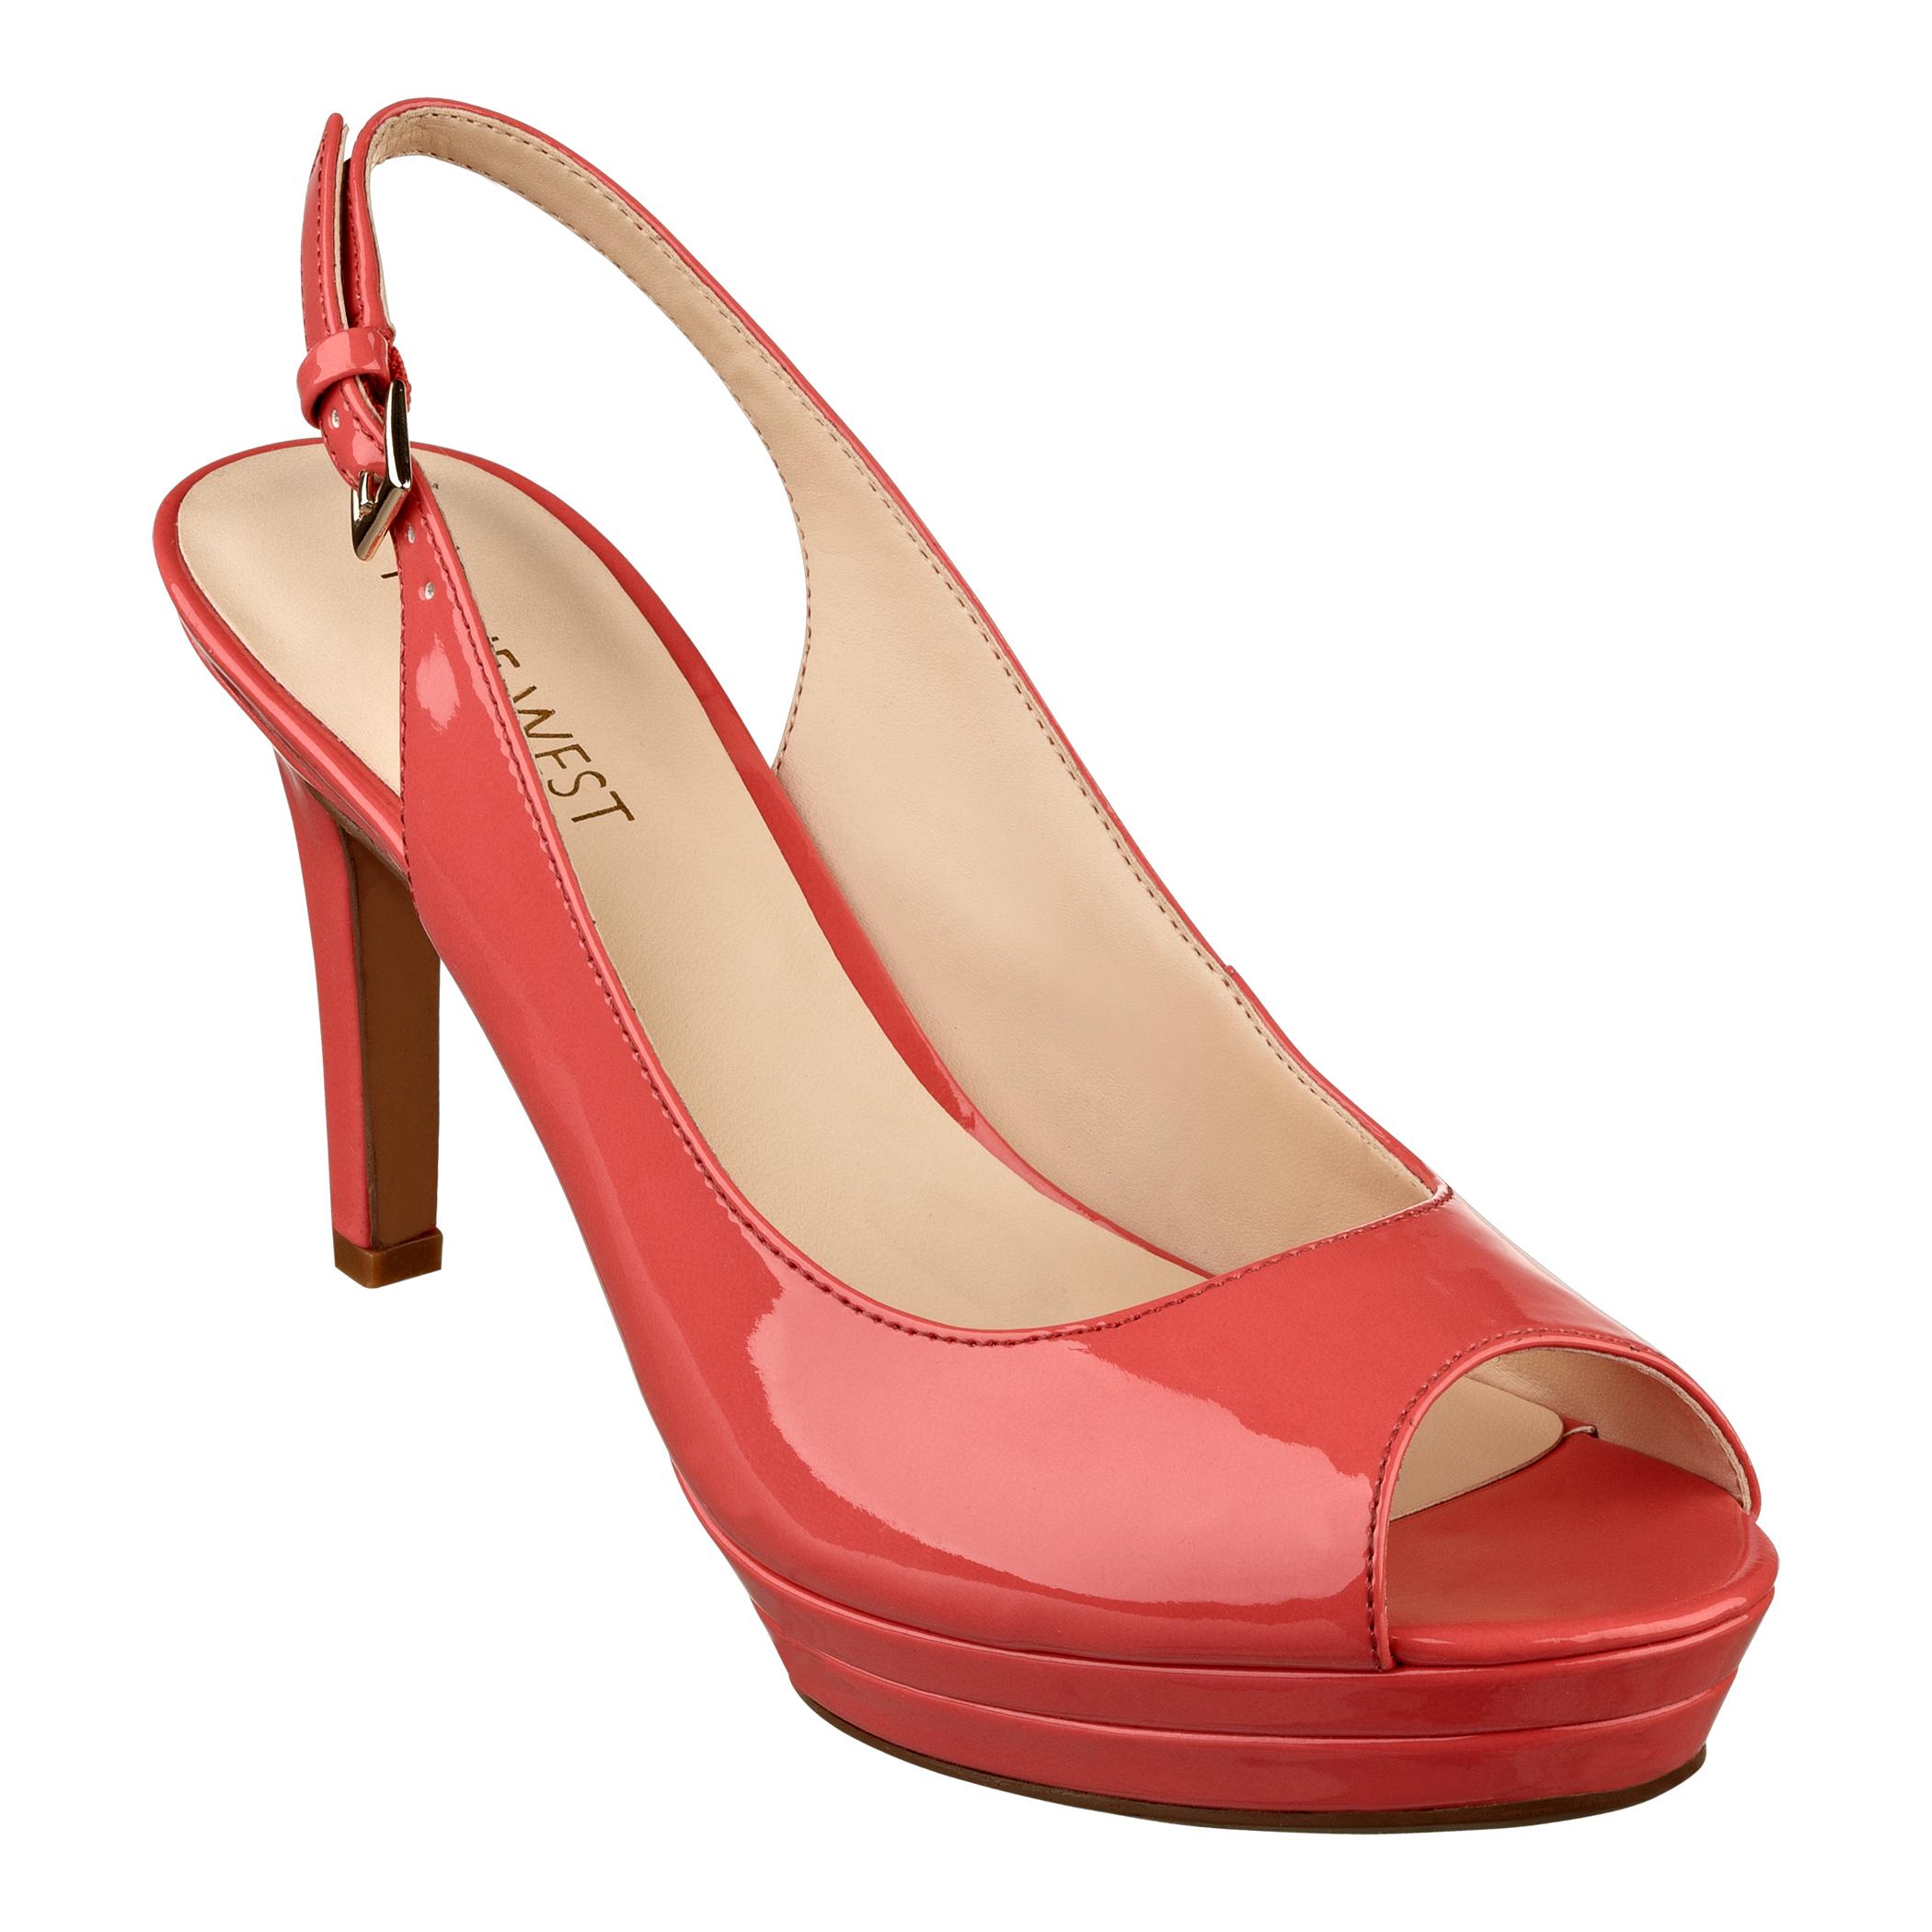 Peach Peep Toe Shoes